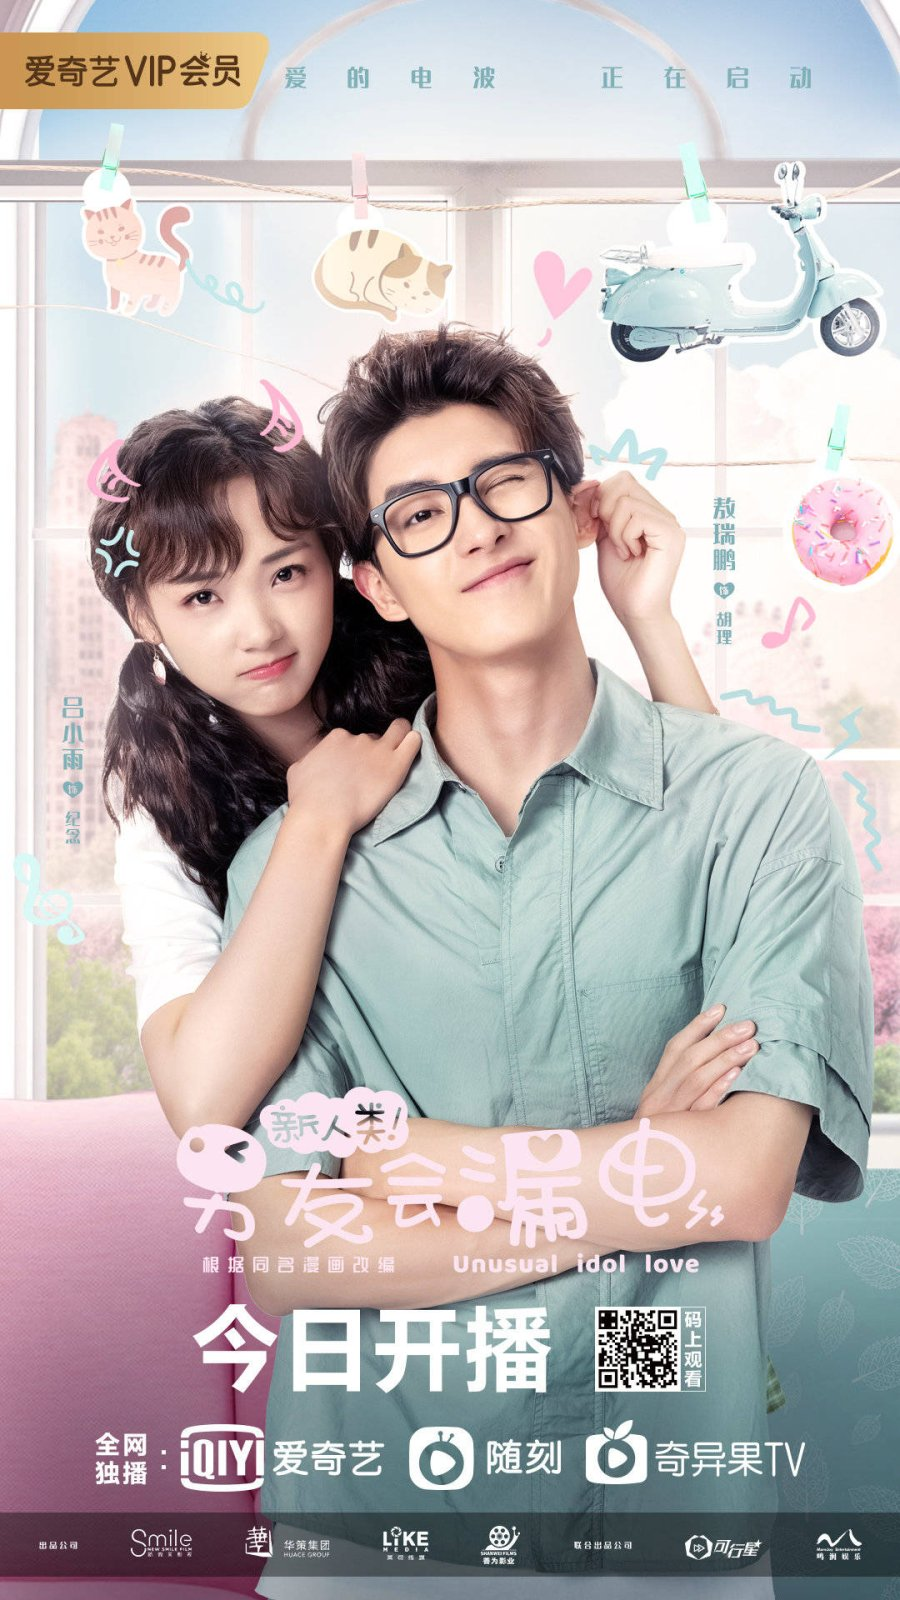 dkJkD 4f - Необычная любовь кумира ✦ 2021 ✦ Китай